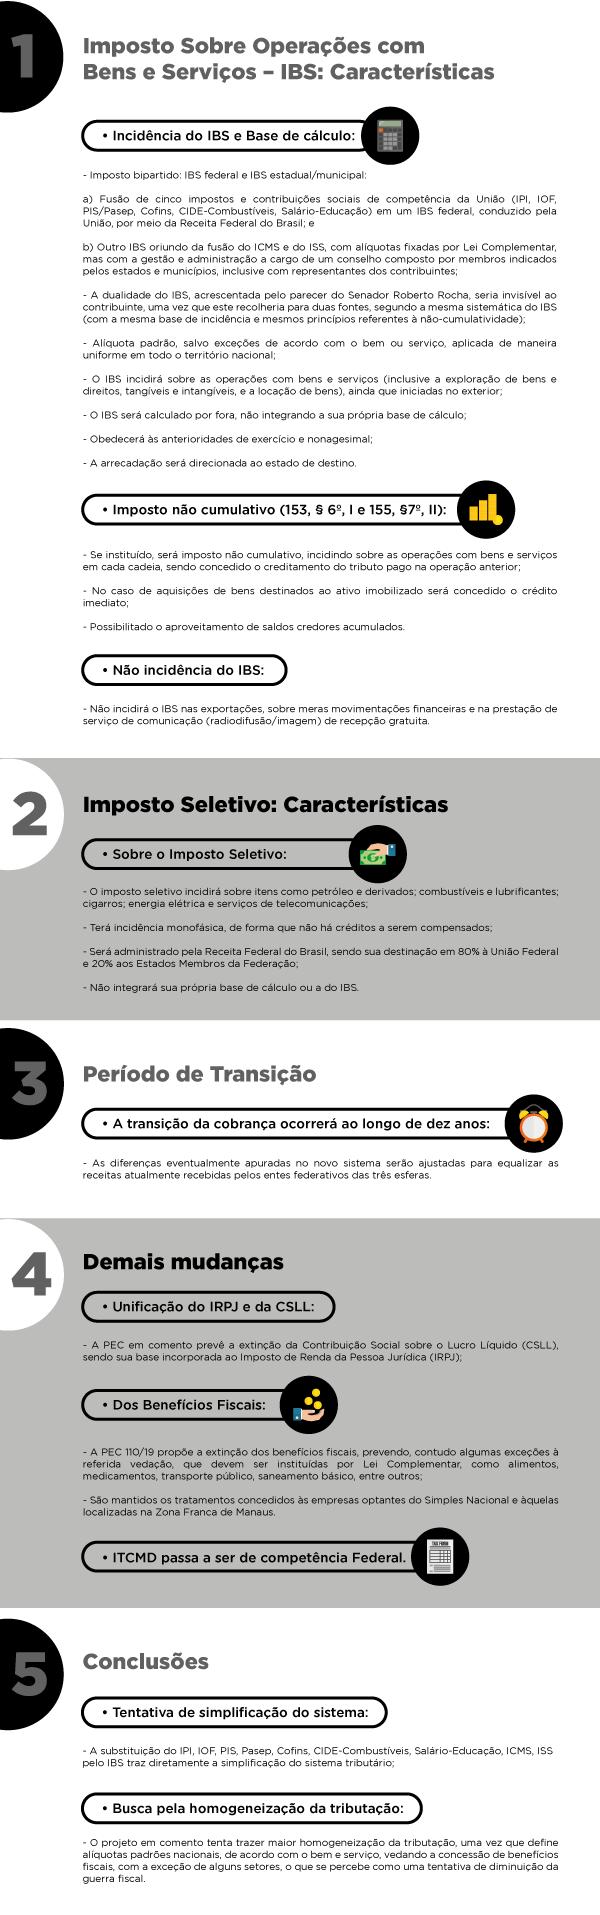 Infográfico News SENADO 2